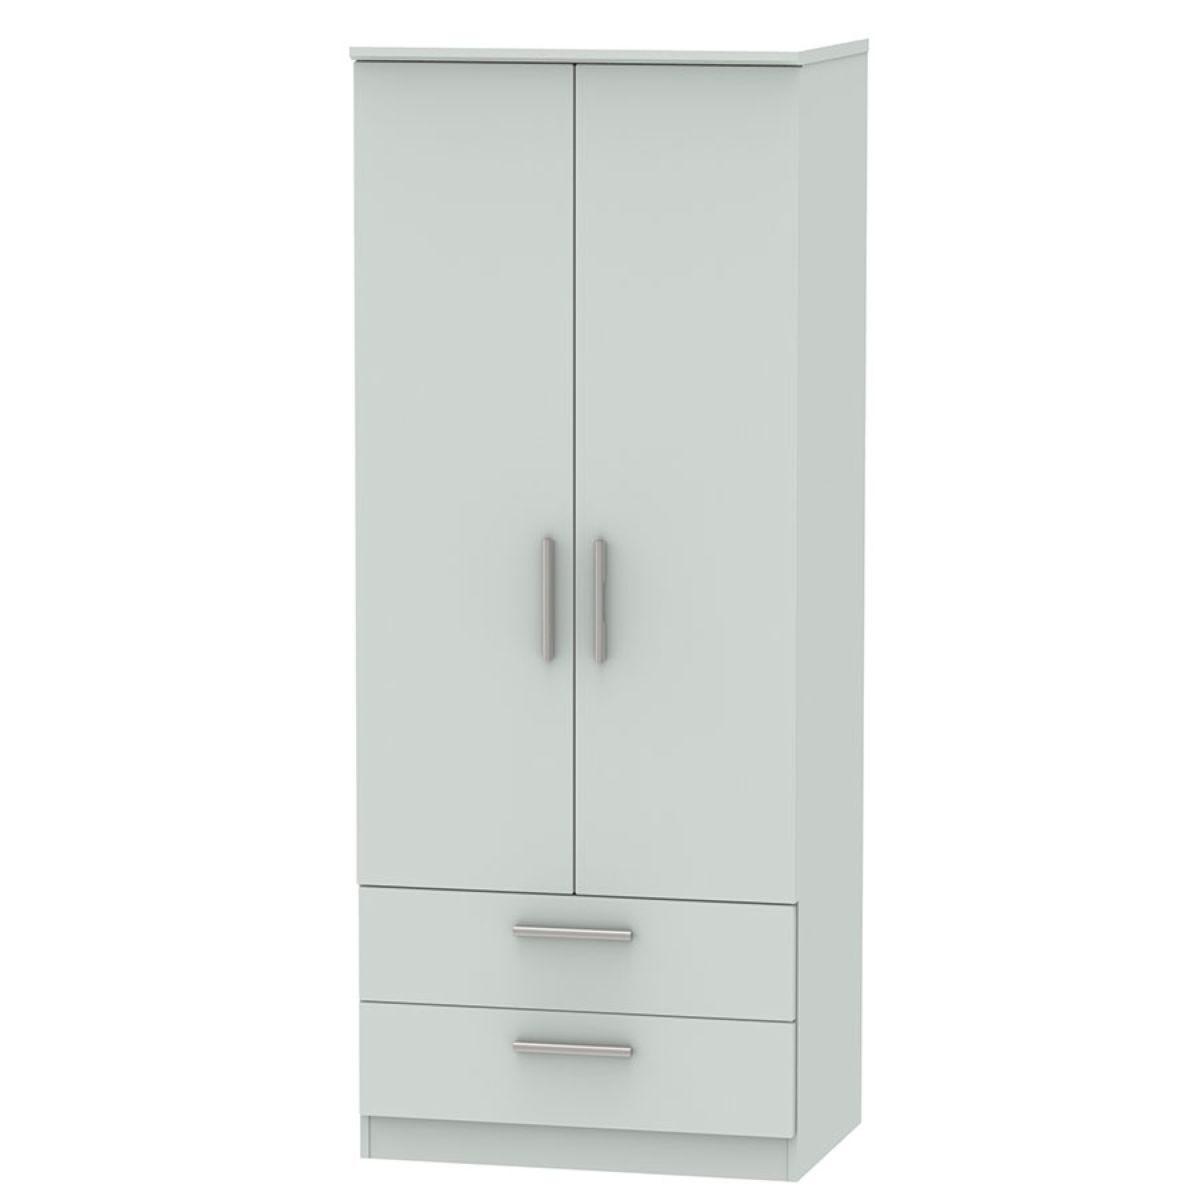 Fourisse 2-Door Wardrobe with Drawers - Grey